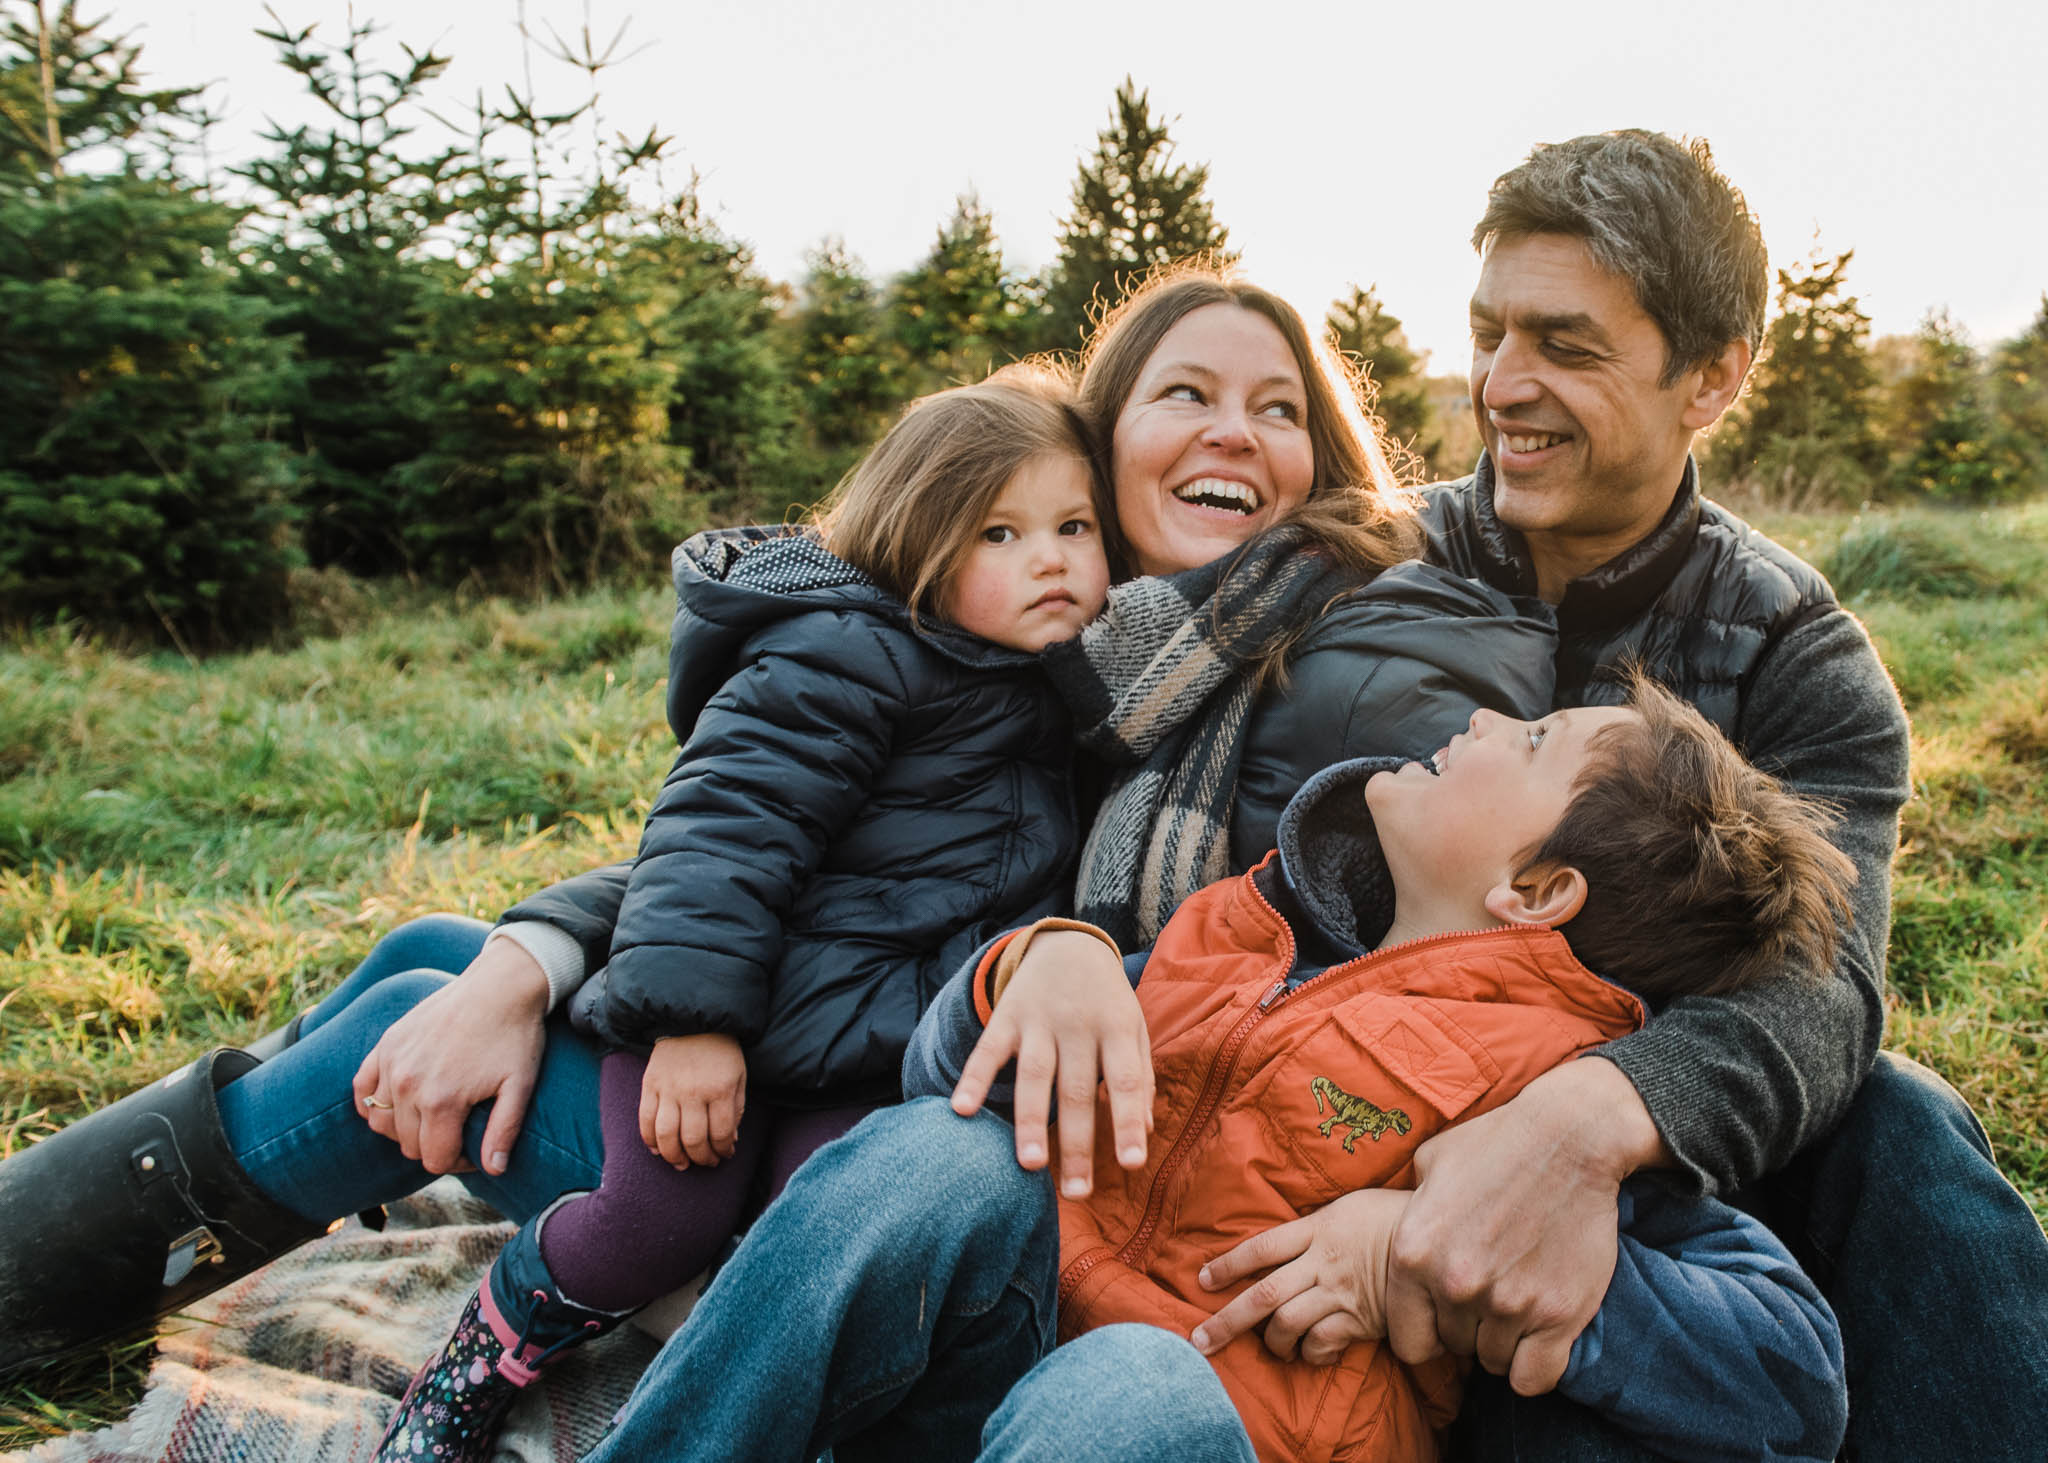 Family photoshoot cotswolds fir.jpg